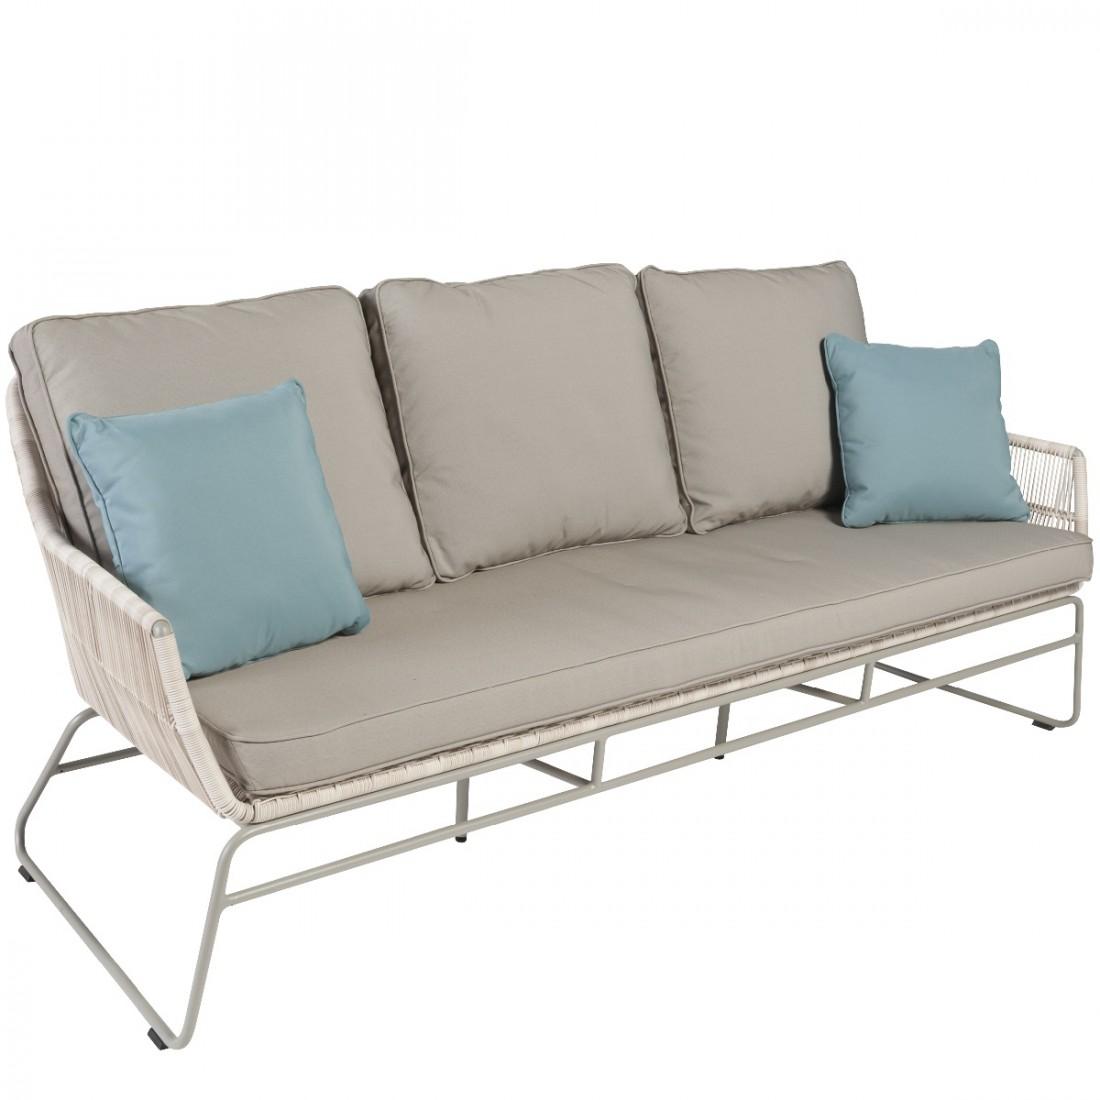 canap de jardin 3 places en r sine tress e maldives. Black Bedroom Furniture Sets. Home Design Ideas